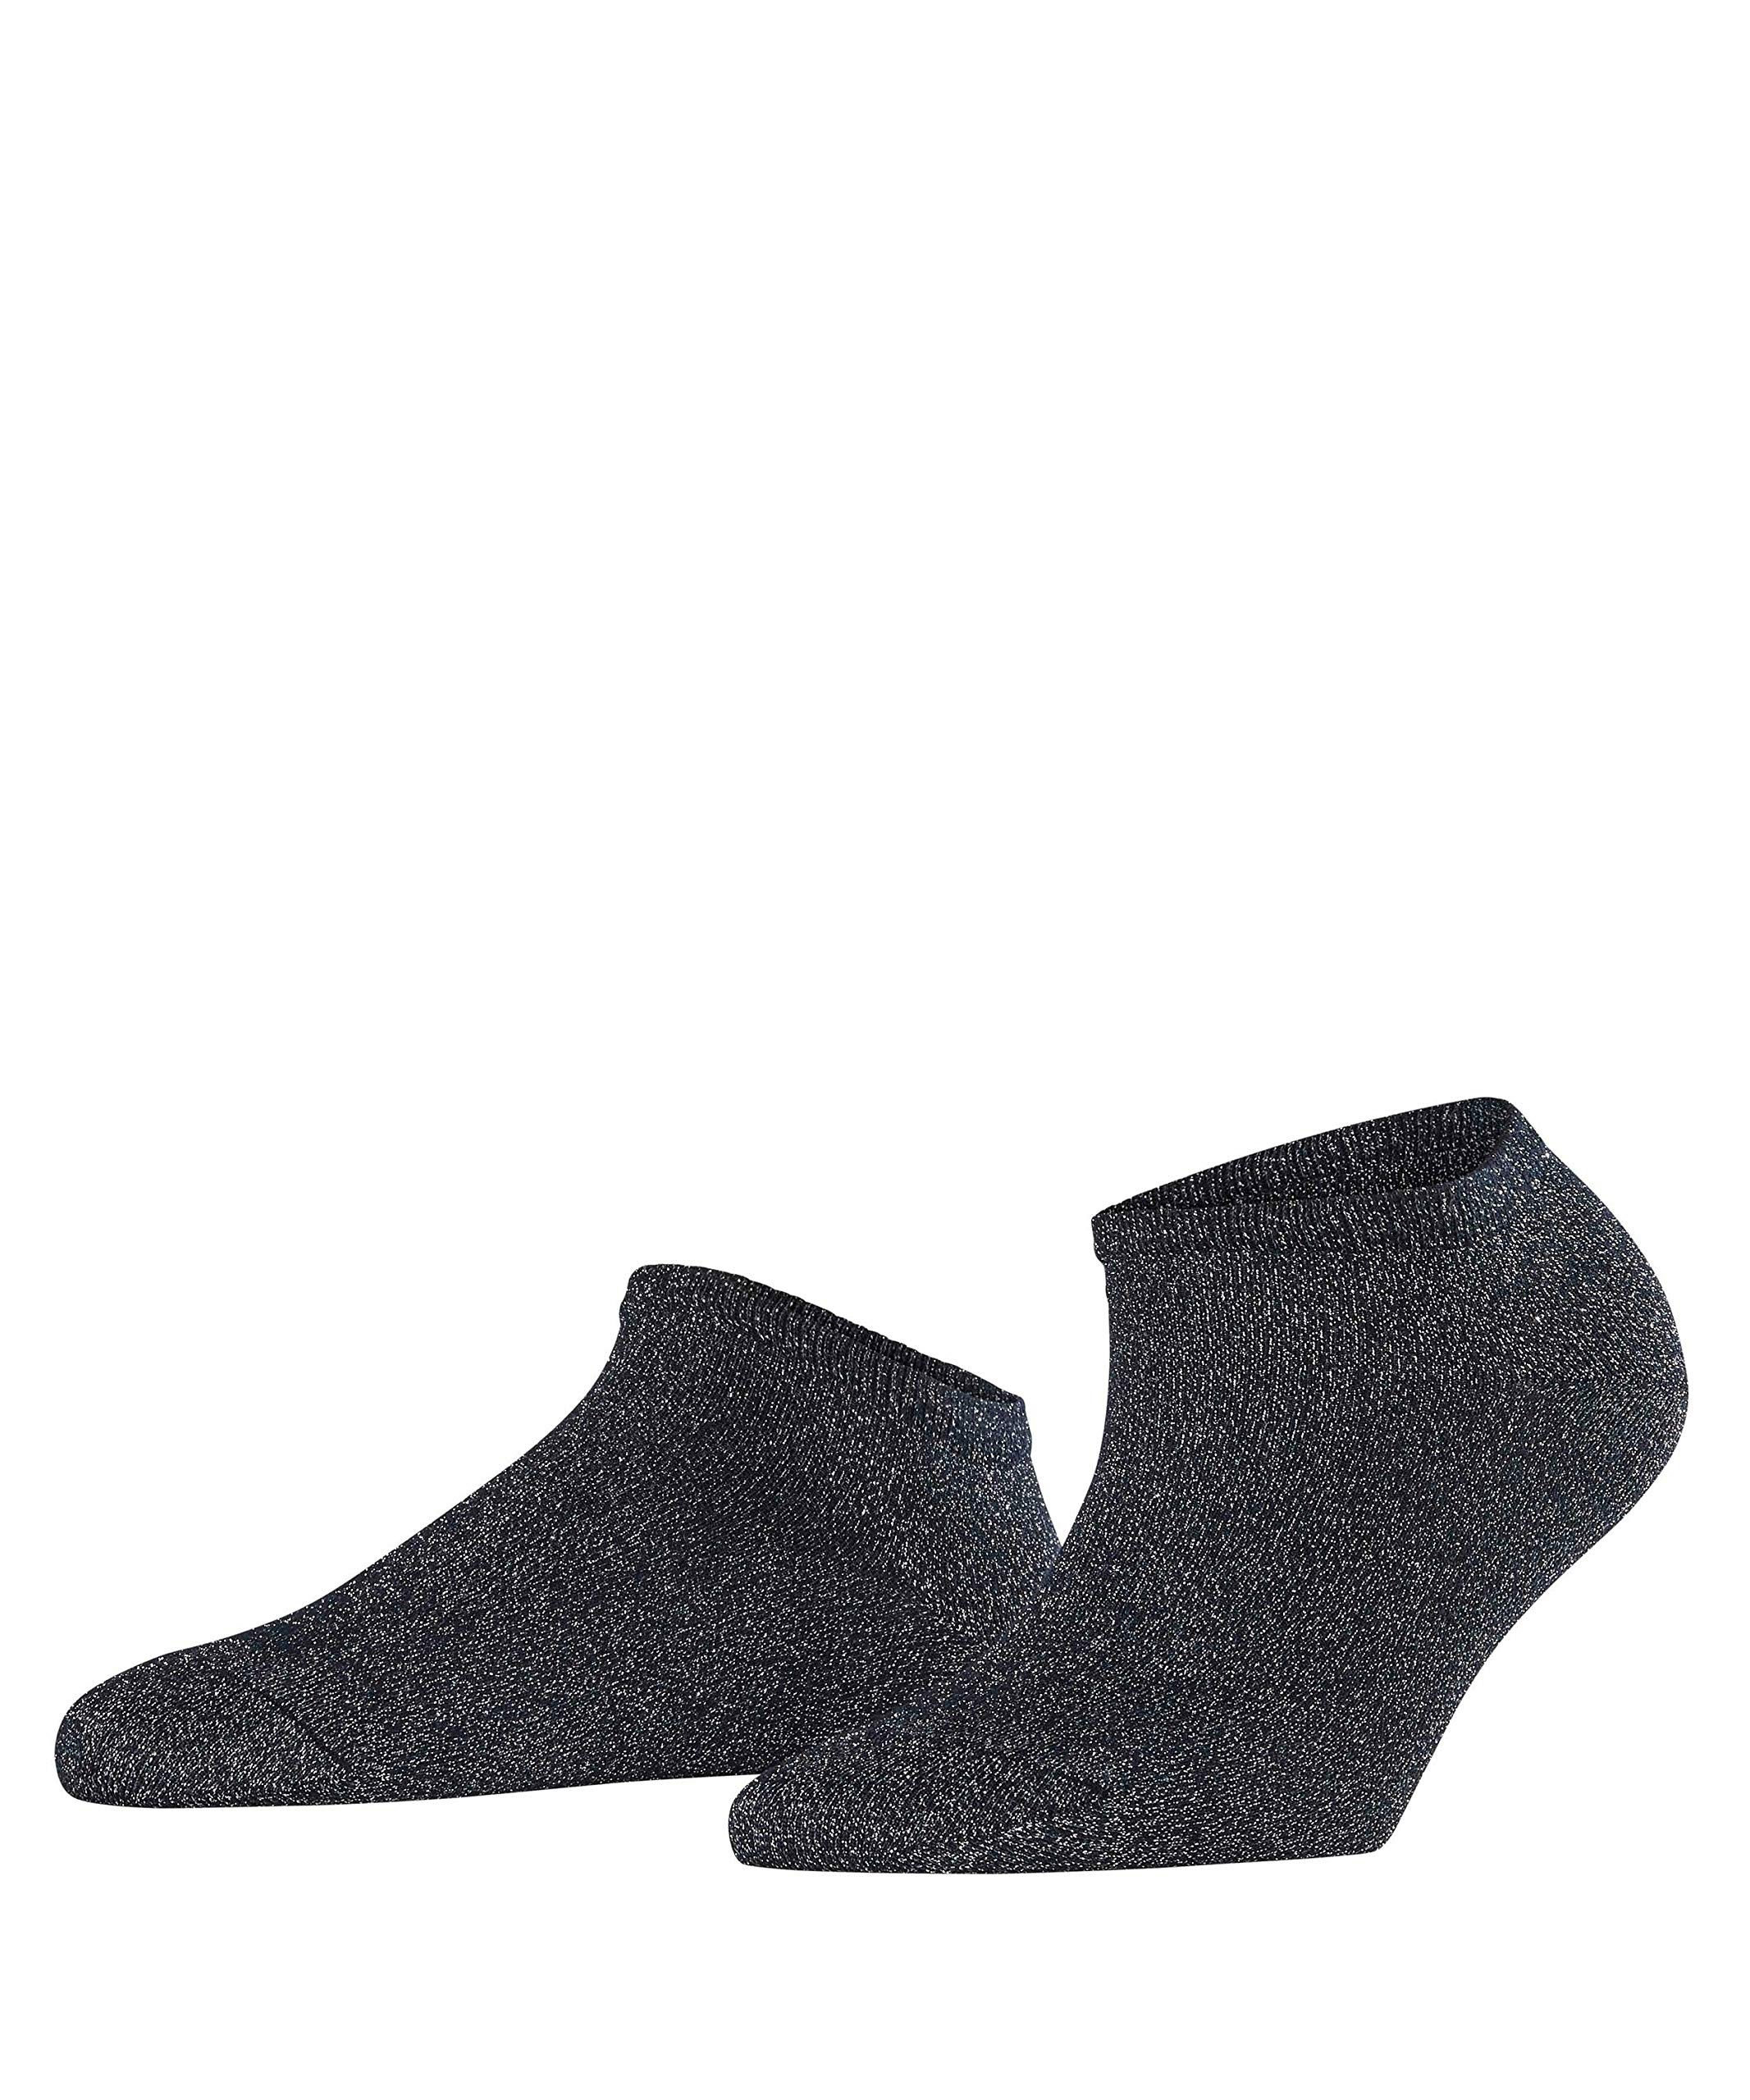 FALKE Womens Shiny Sneaker Casual Sock - Viscose Blend, Multiple Colors, US sizes 5 to 10.5, 1 Pair